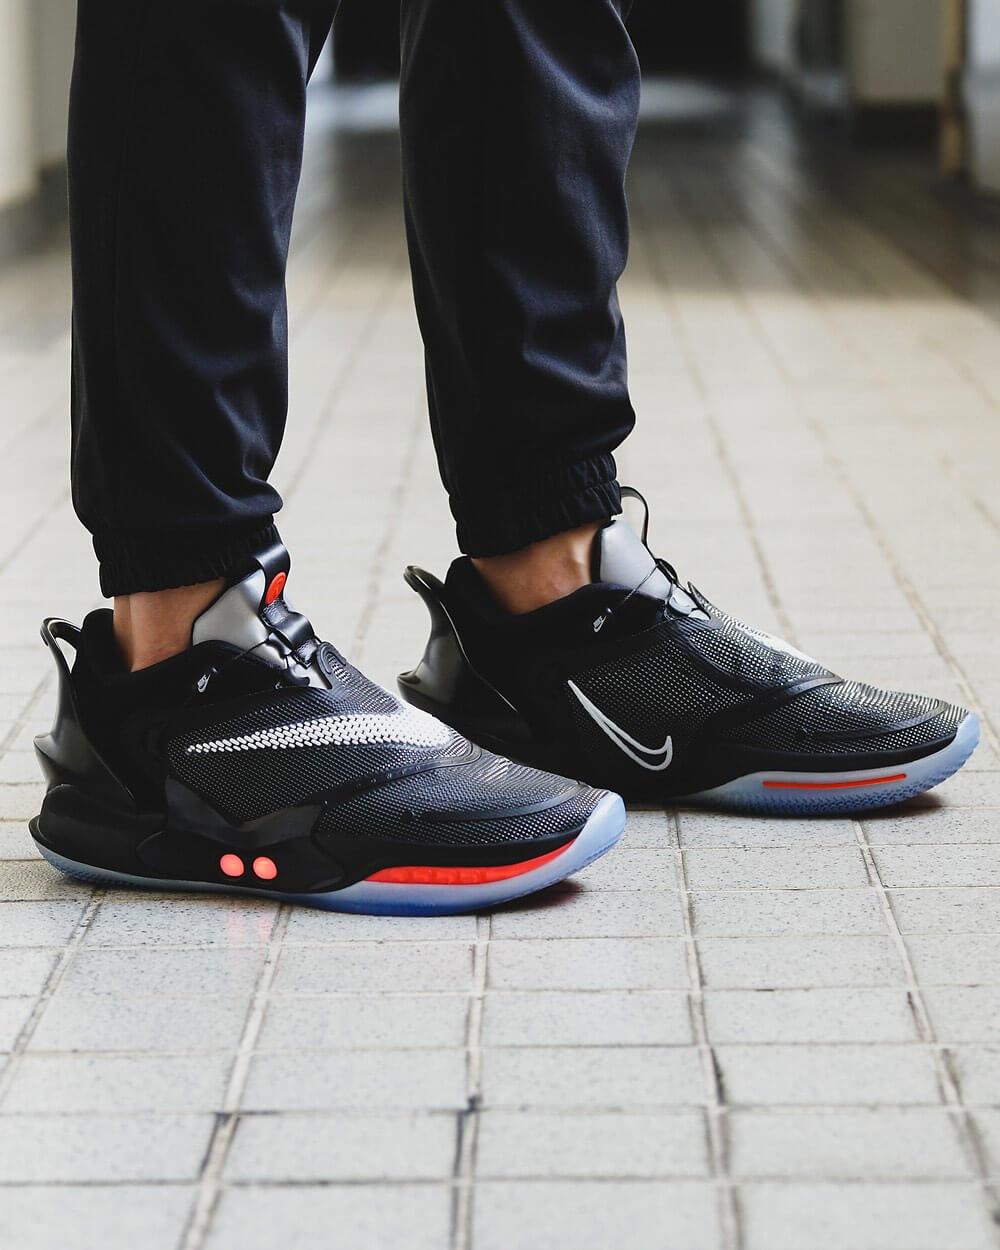 Nike Adapt BB 2.0 high tech sneakers